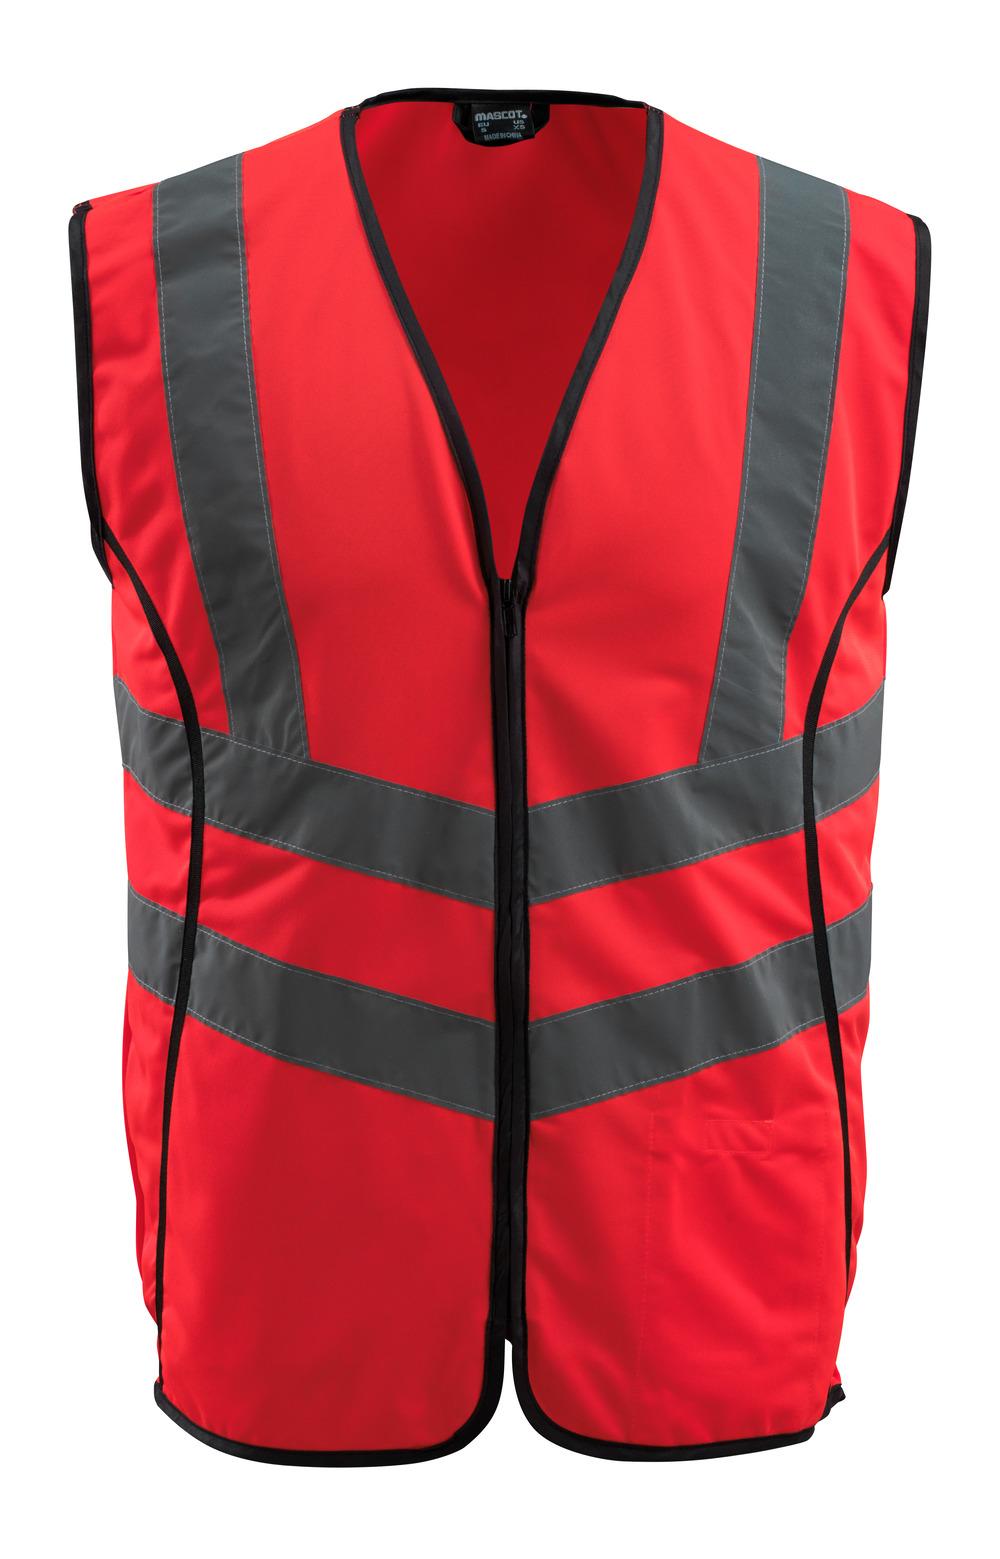 50145-982-222 Gilet de circulation - Hi-vis rouge